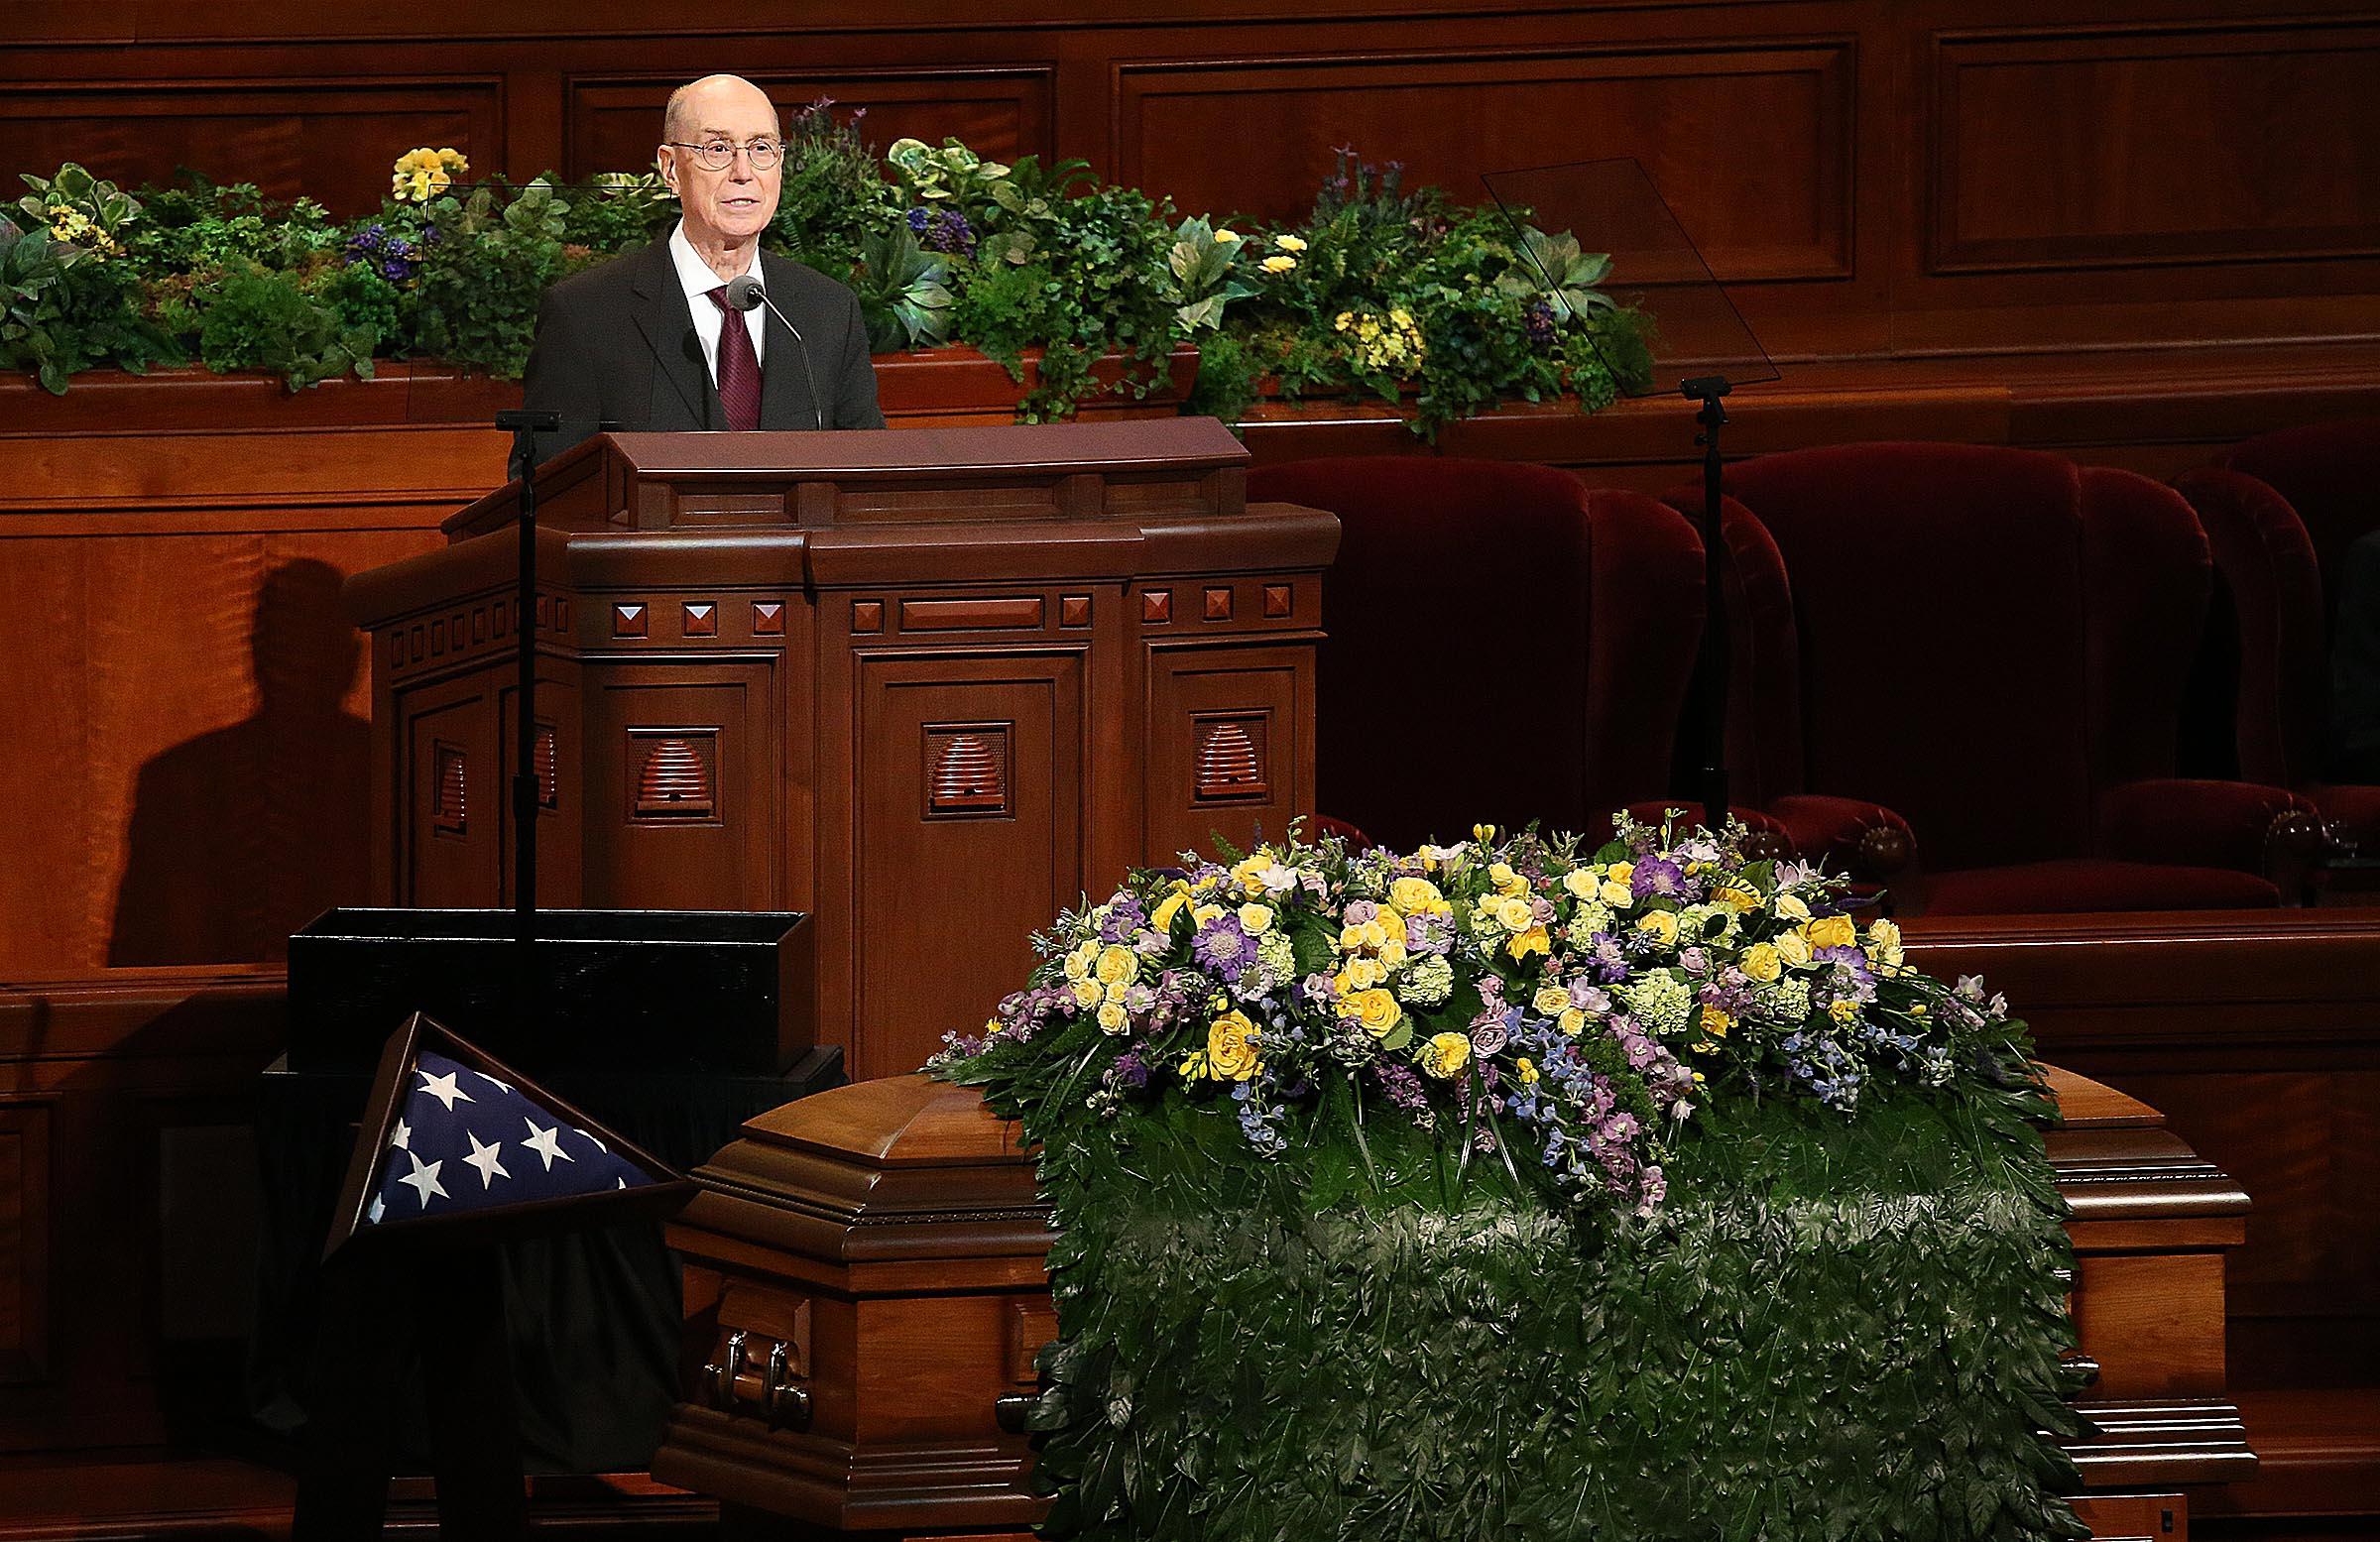 President Henry B. Eyring speaks at Church President Thomas S. Monson's funeral at the Conference Center in Salt Lake City on Friday, Jan. 12, 2018. President Eyring was one of President Monson's counselors.